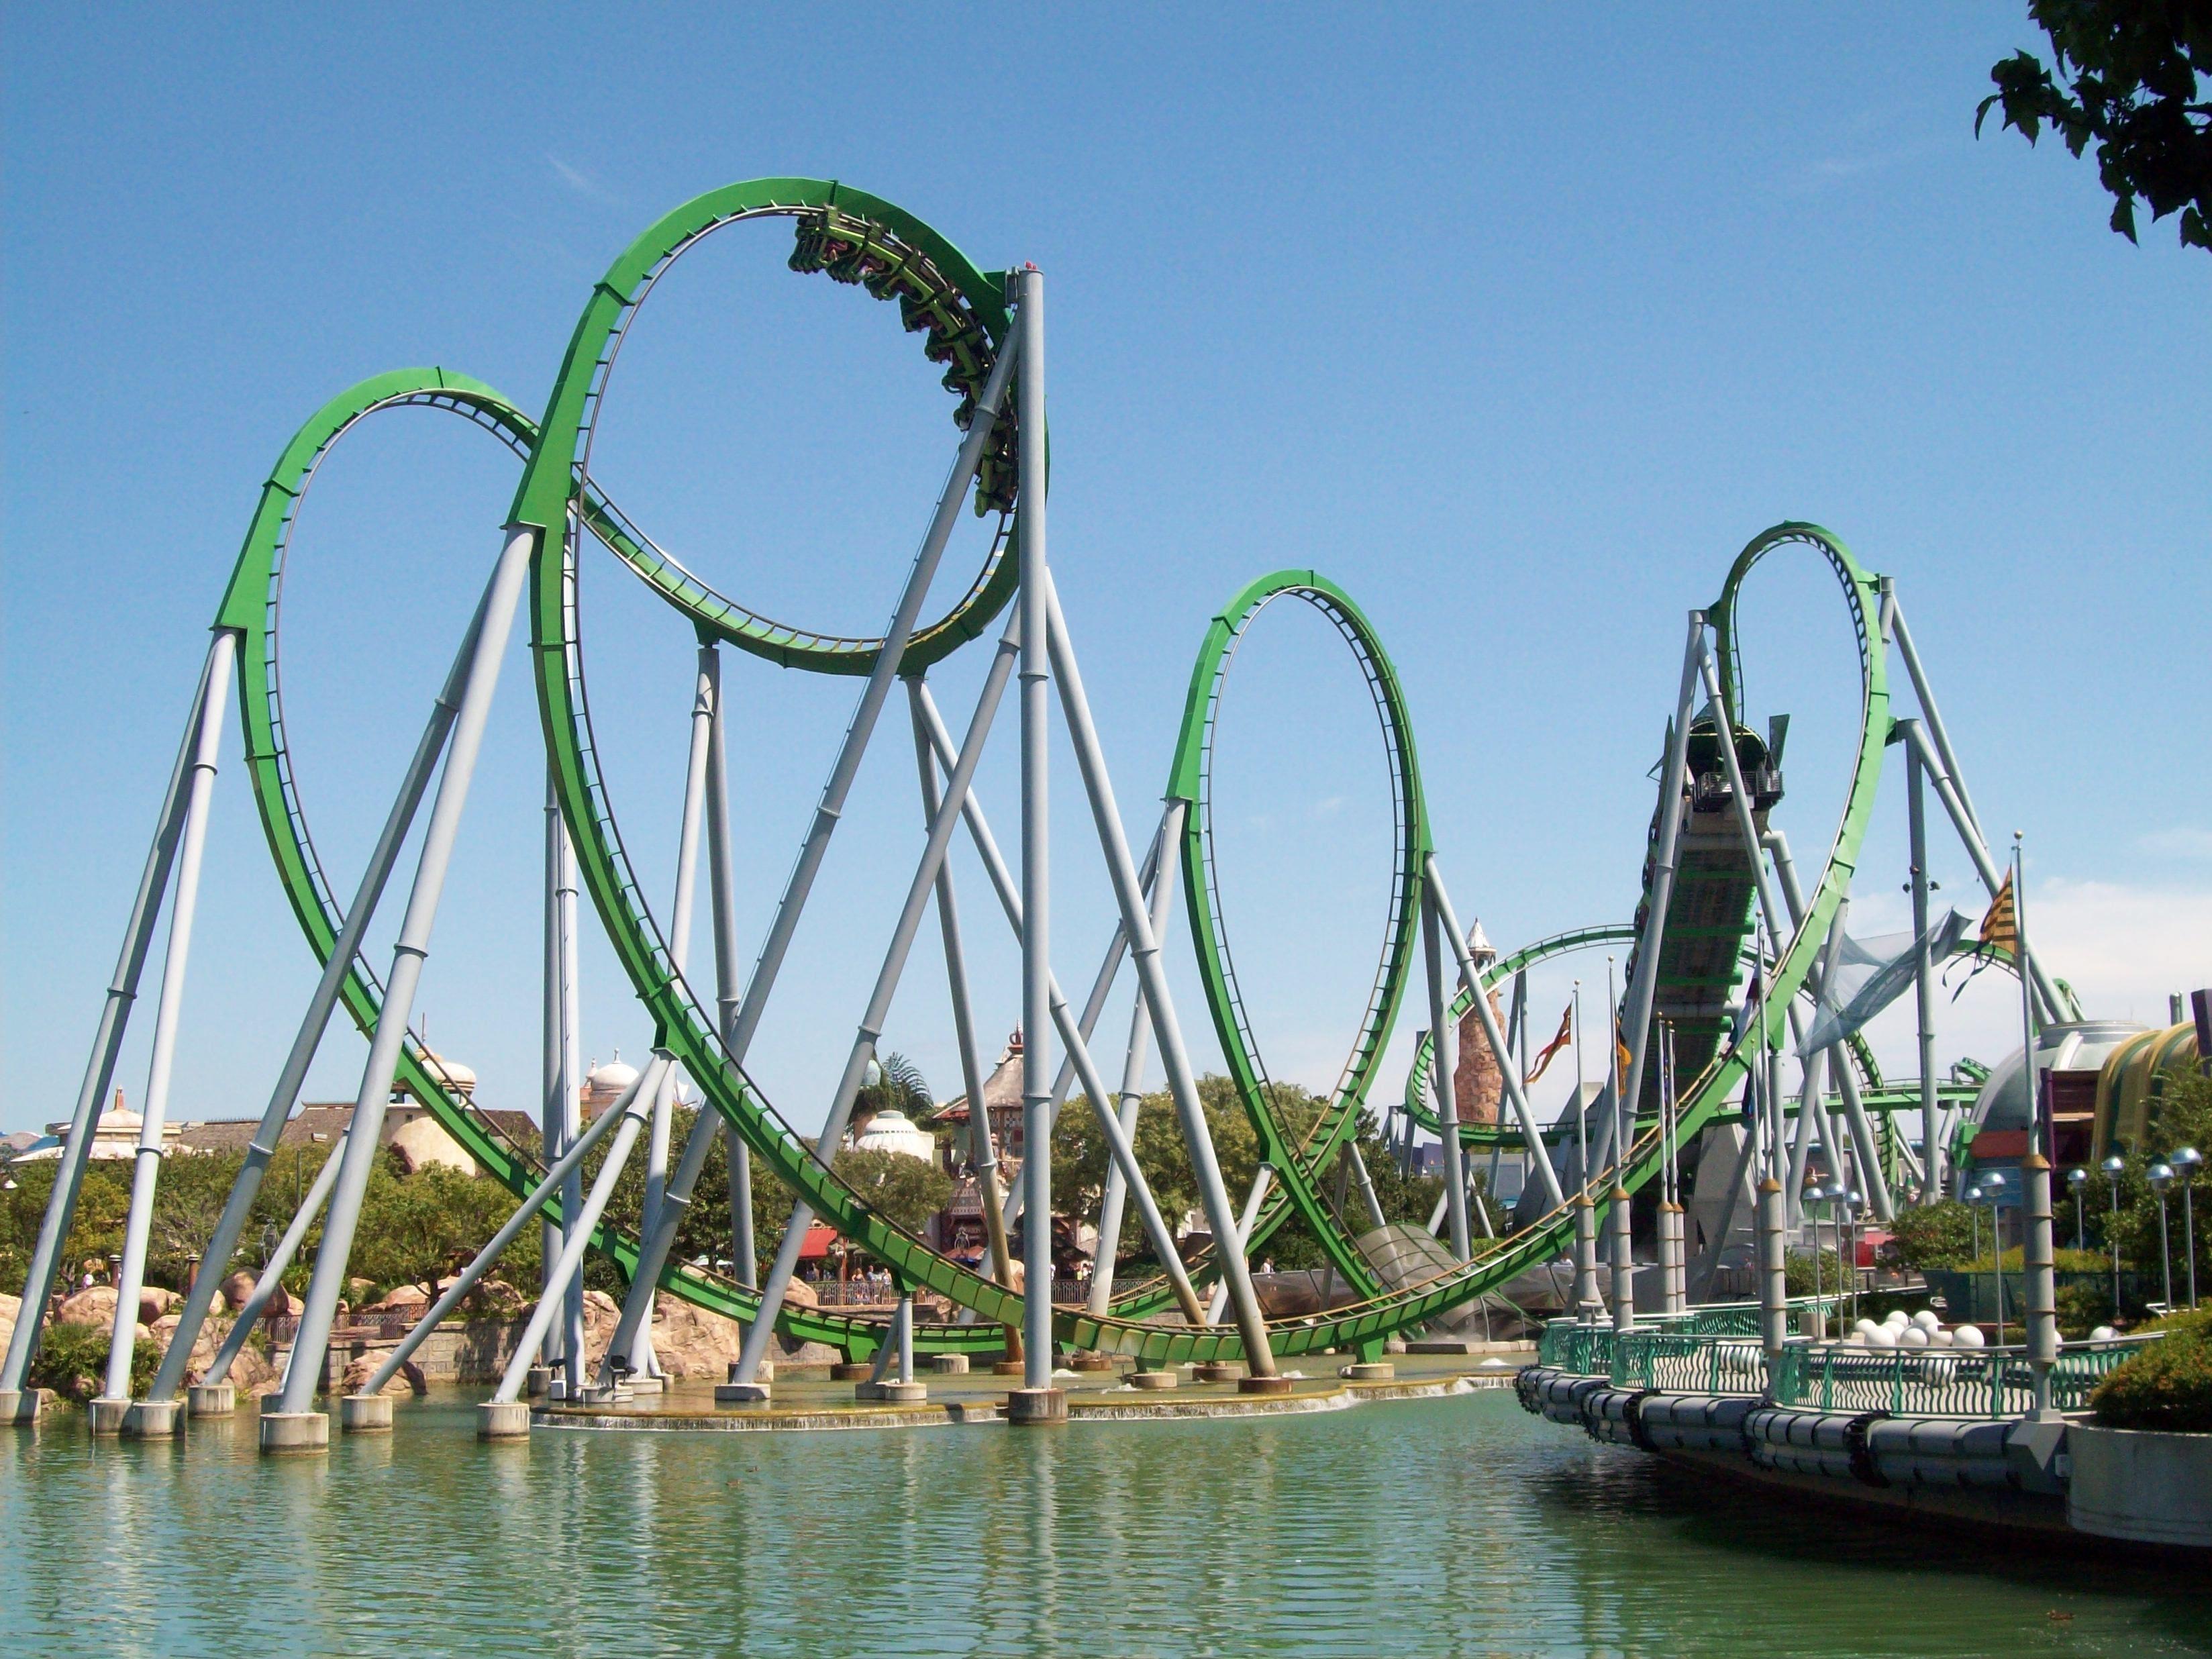 Orlando Universal Rollercoasters